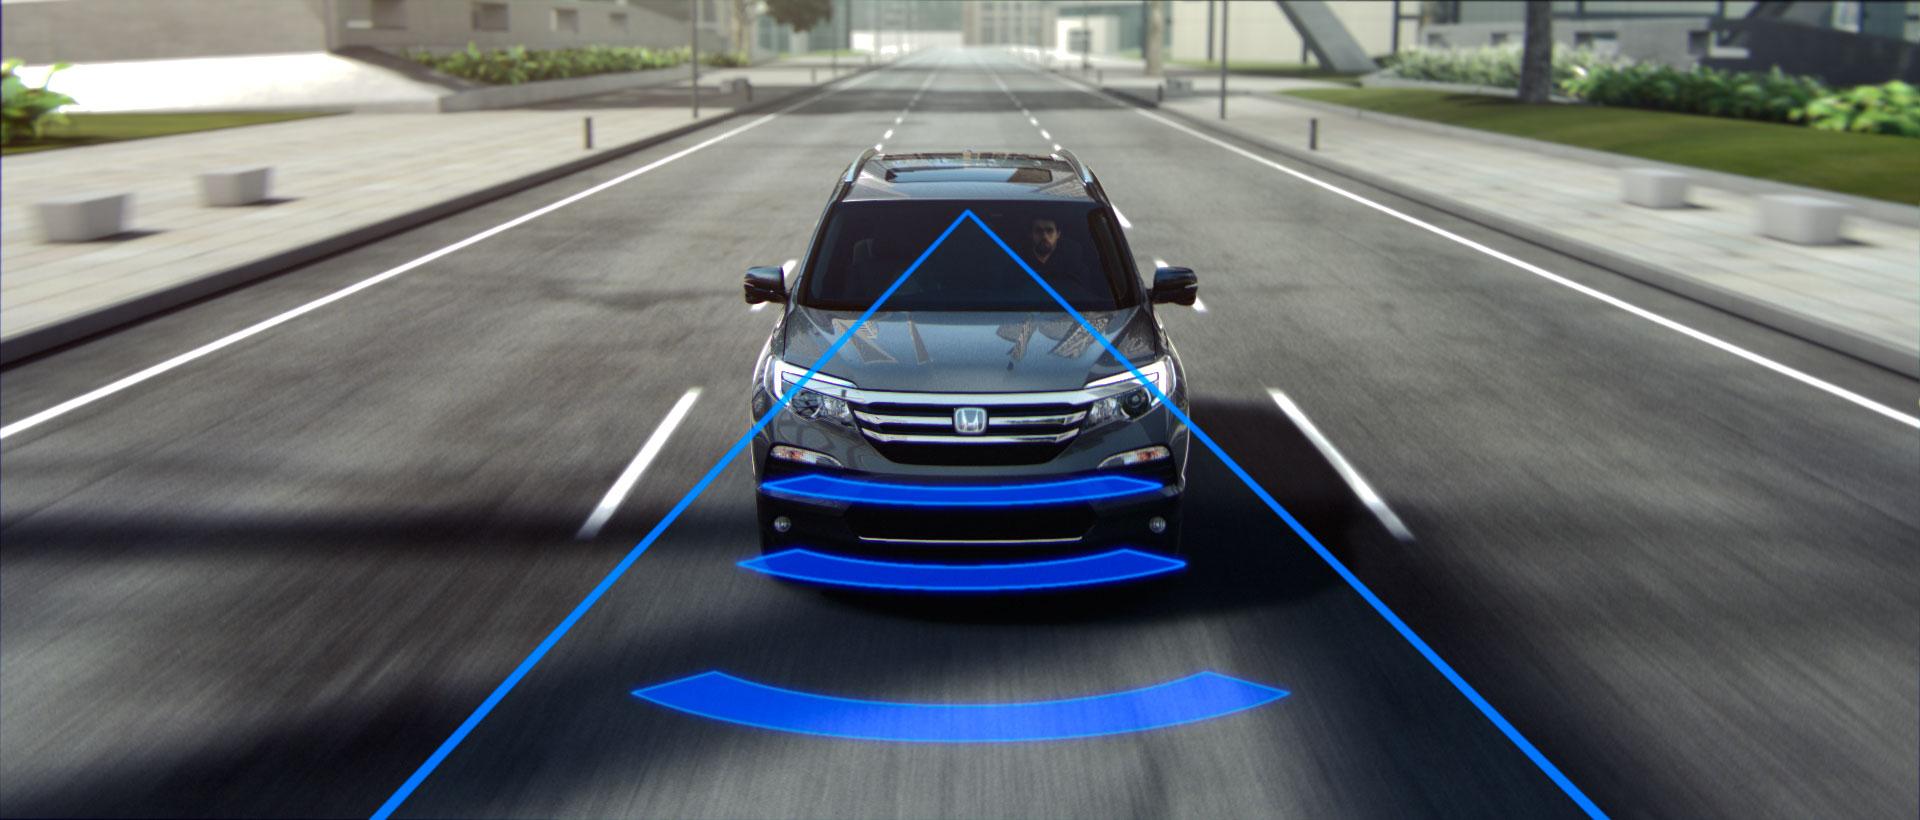 collision-mitigation-braking-system.Brandsynario